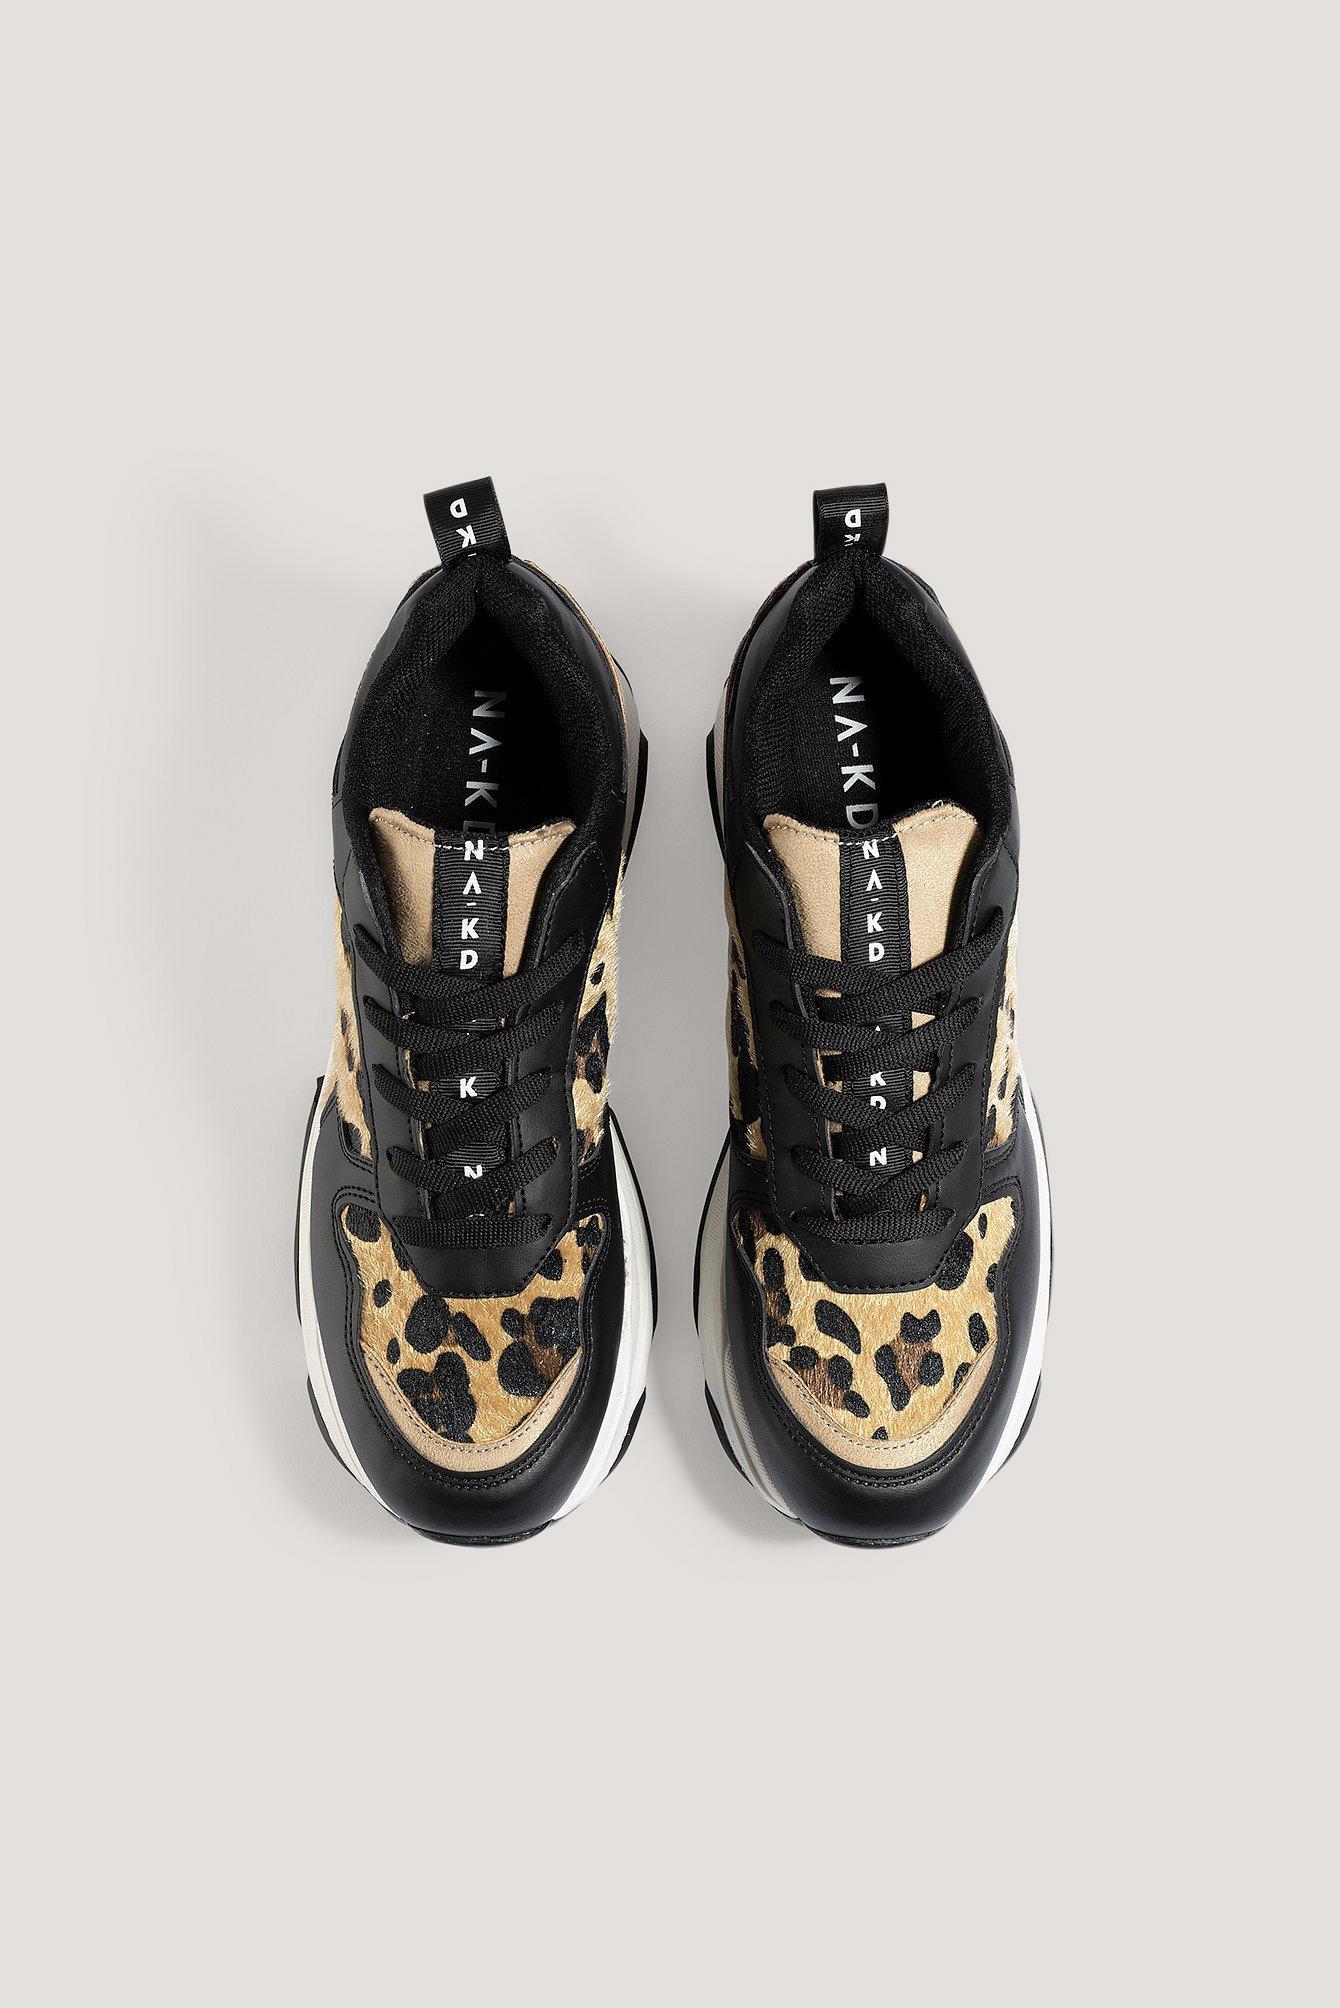 Leopard Detailed Chunky Trainers Synthétique NA-KD en coloris Noir